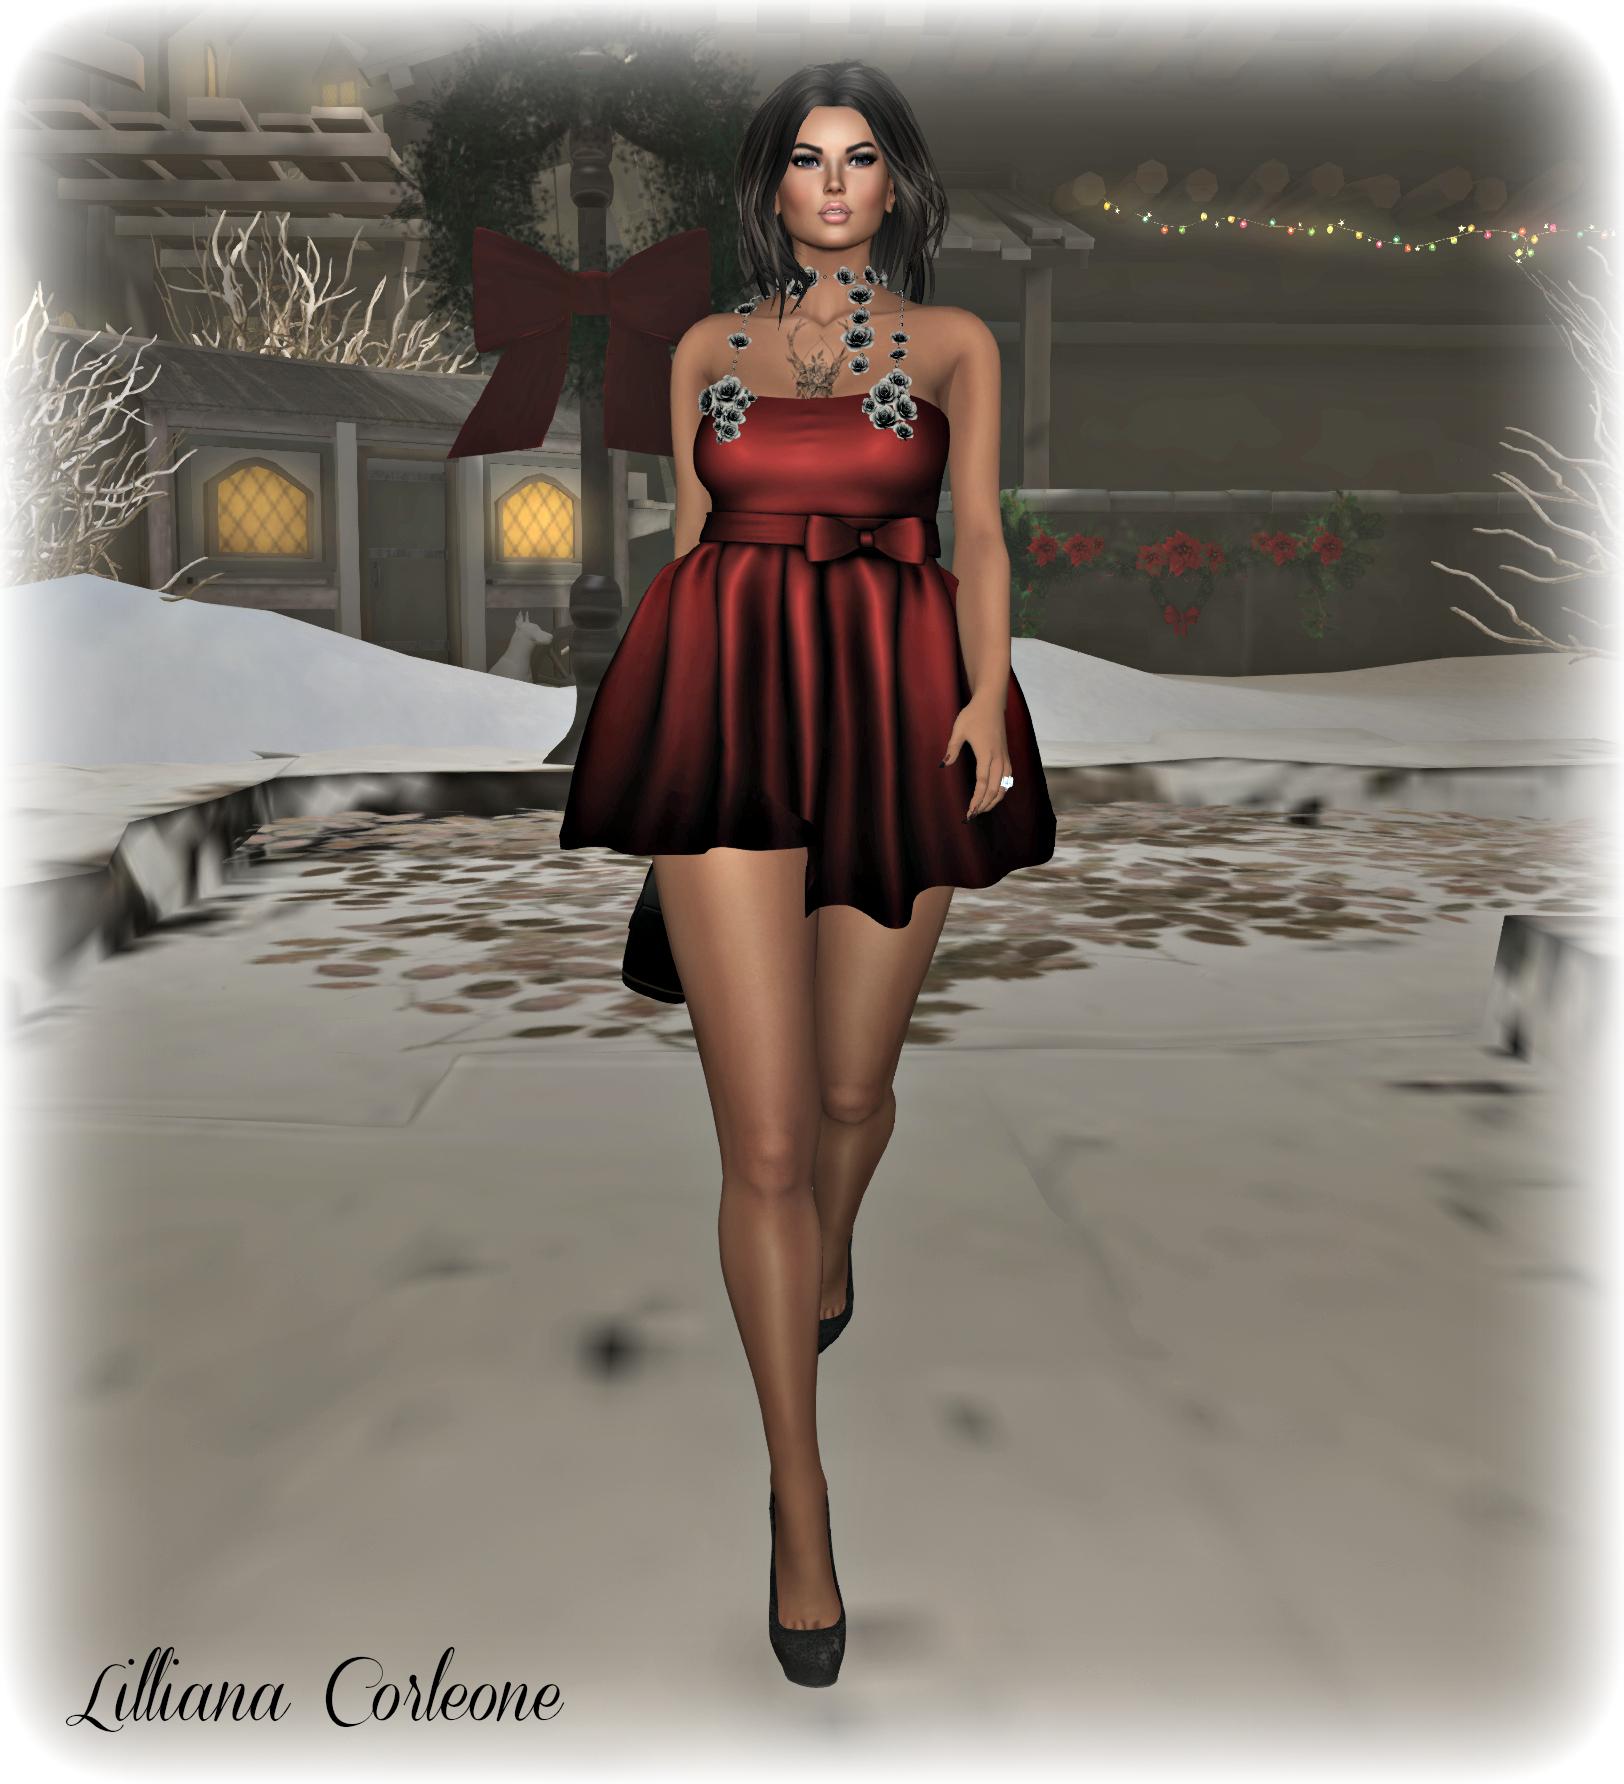 december-31st-blog-post-photo-5_cropped